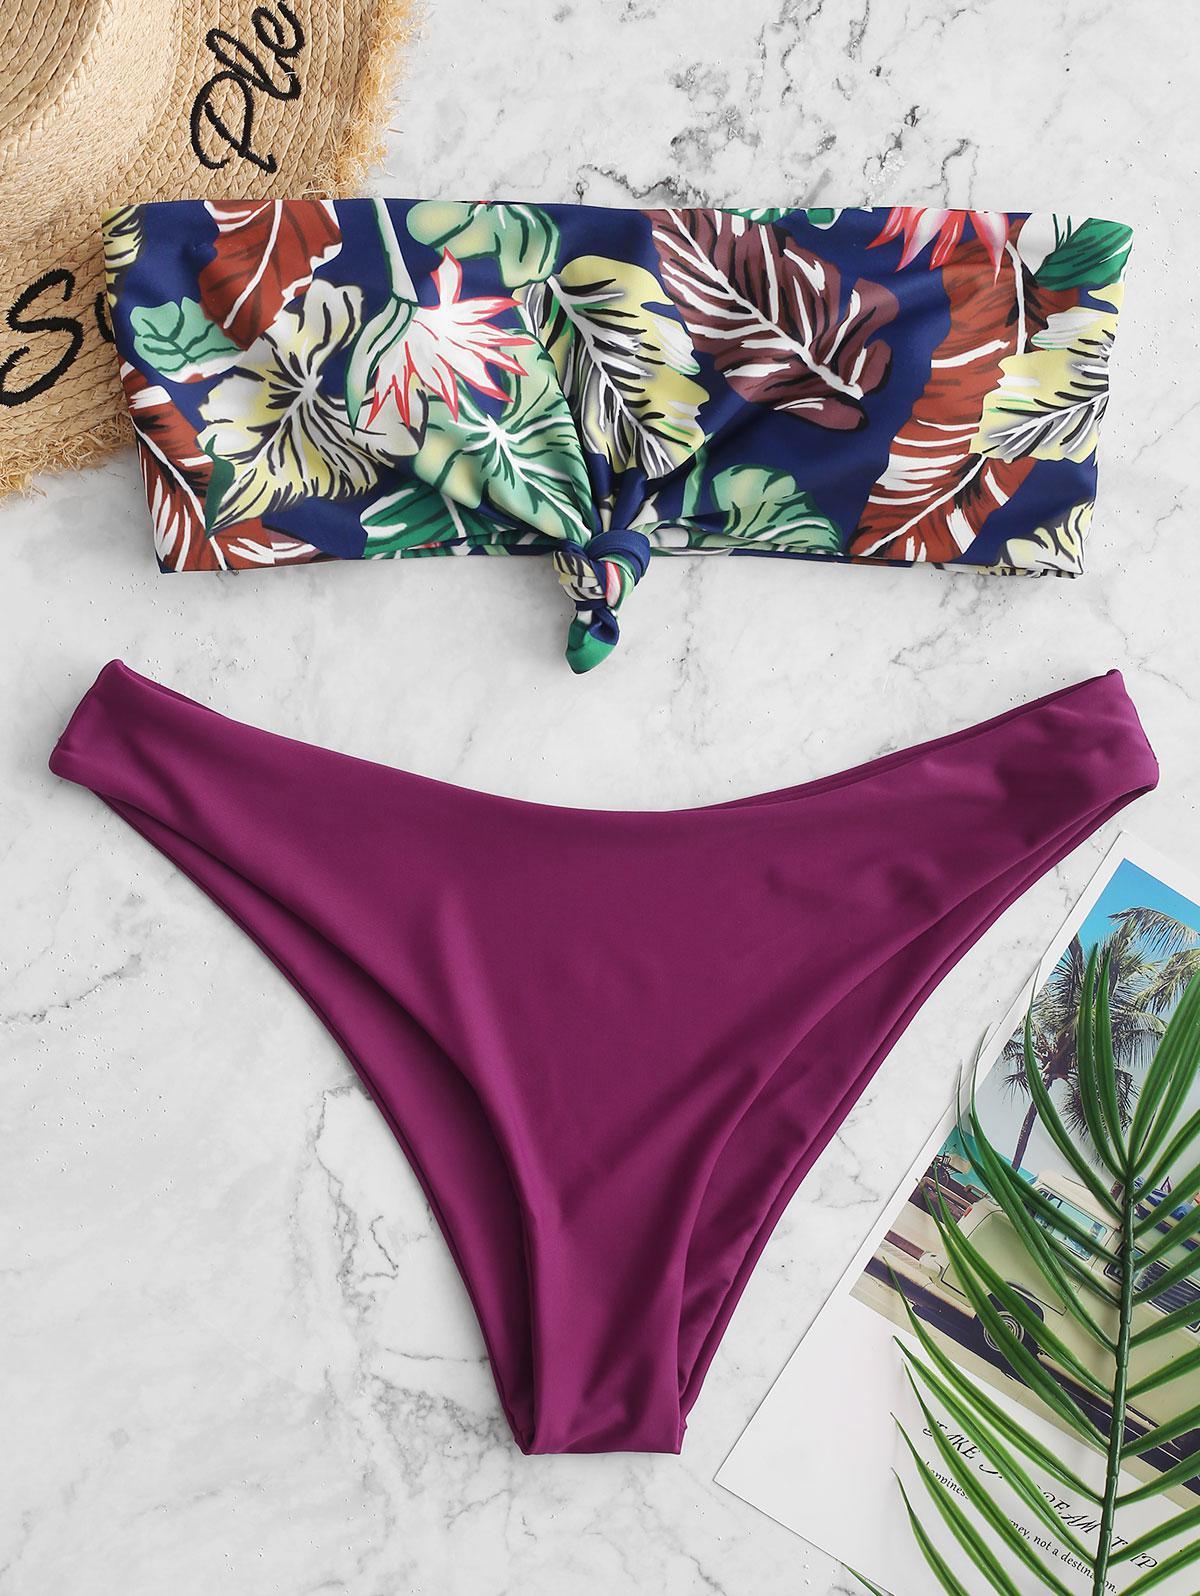 ZAFUL Knot Tropical Leaf Print Bikini Bandeau Swimsuit, Plum velvet